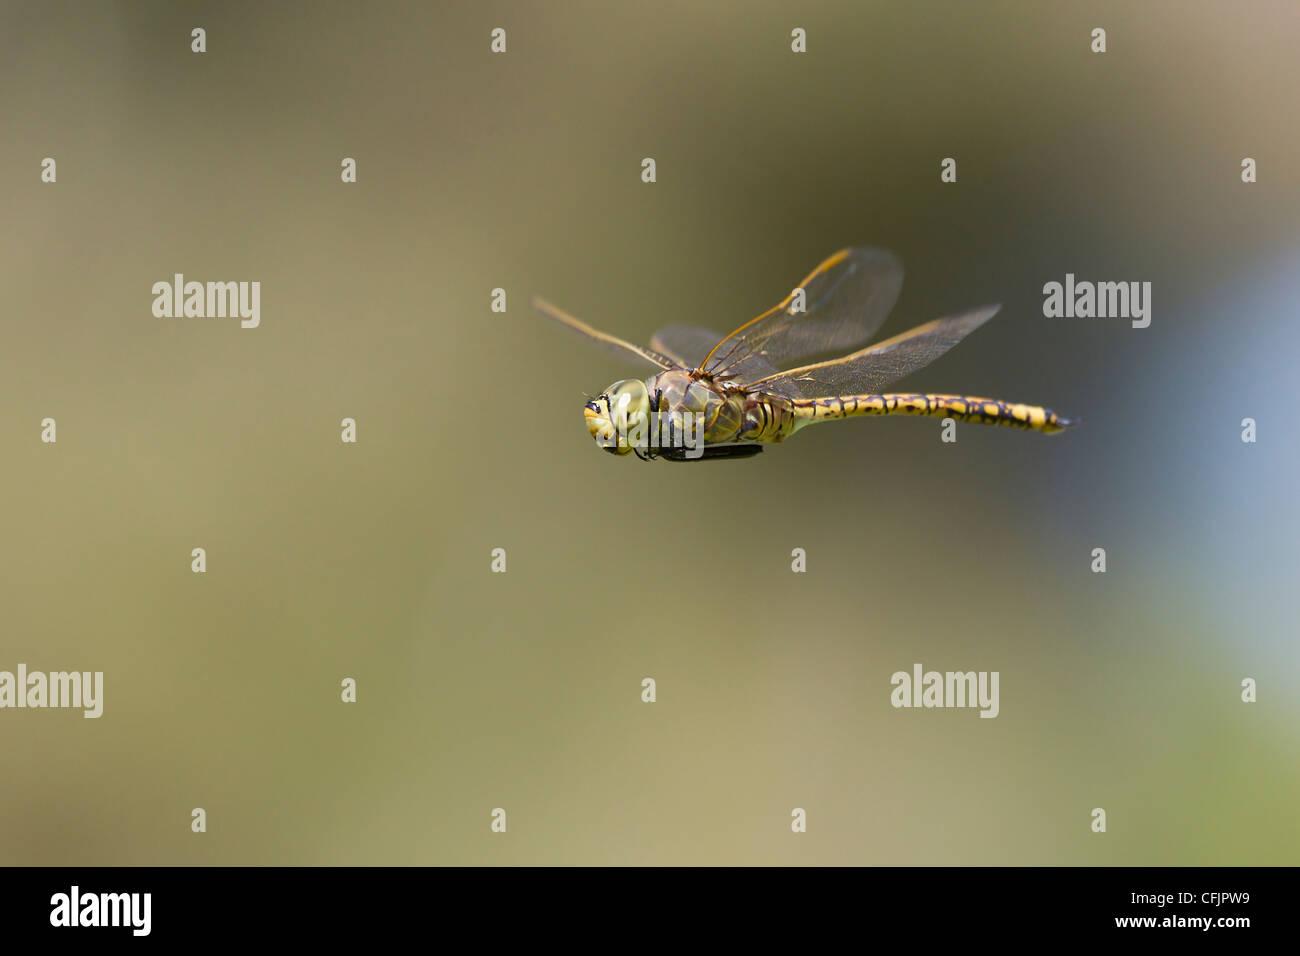 Australian Dragonfly Invertebrate Invertebrates - Stock Image